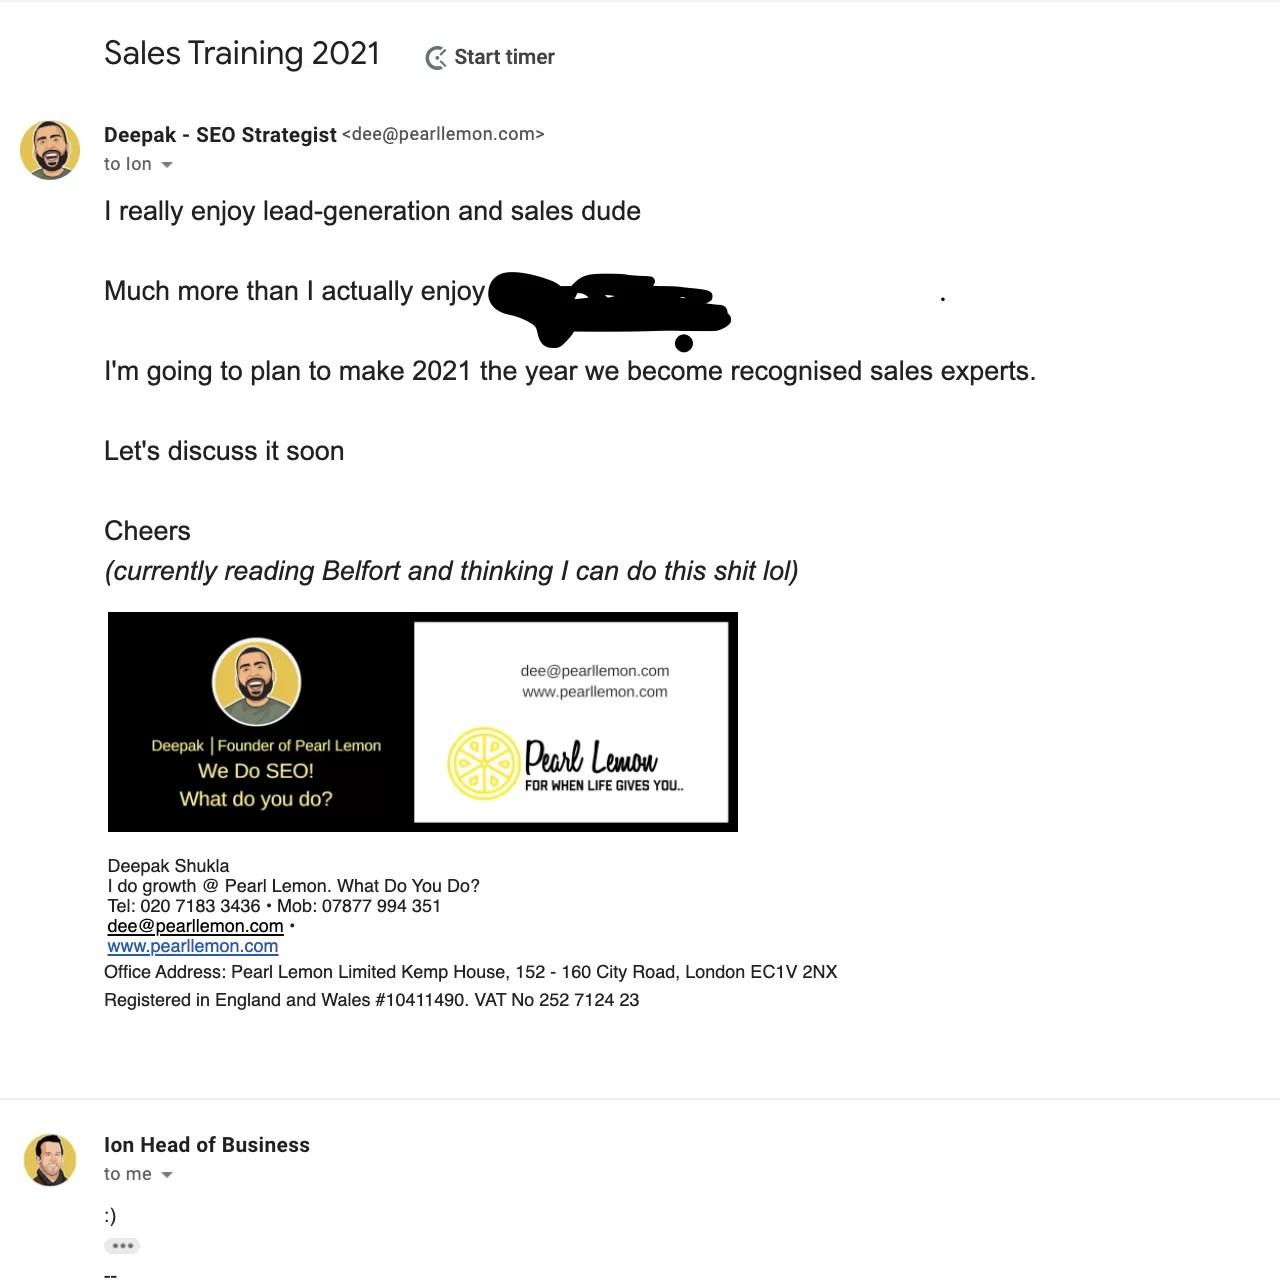 sales traing 2021